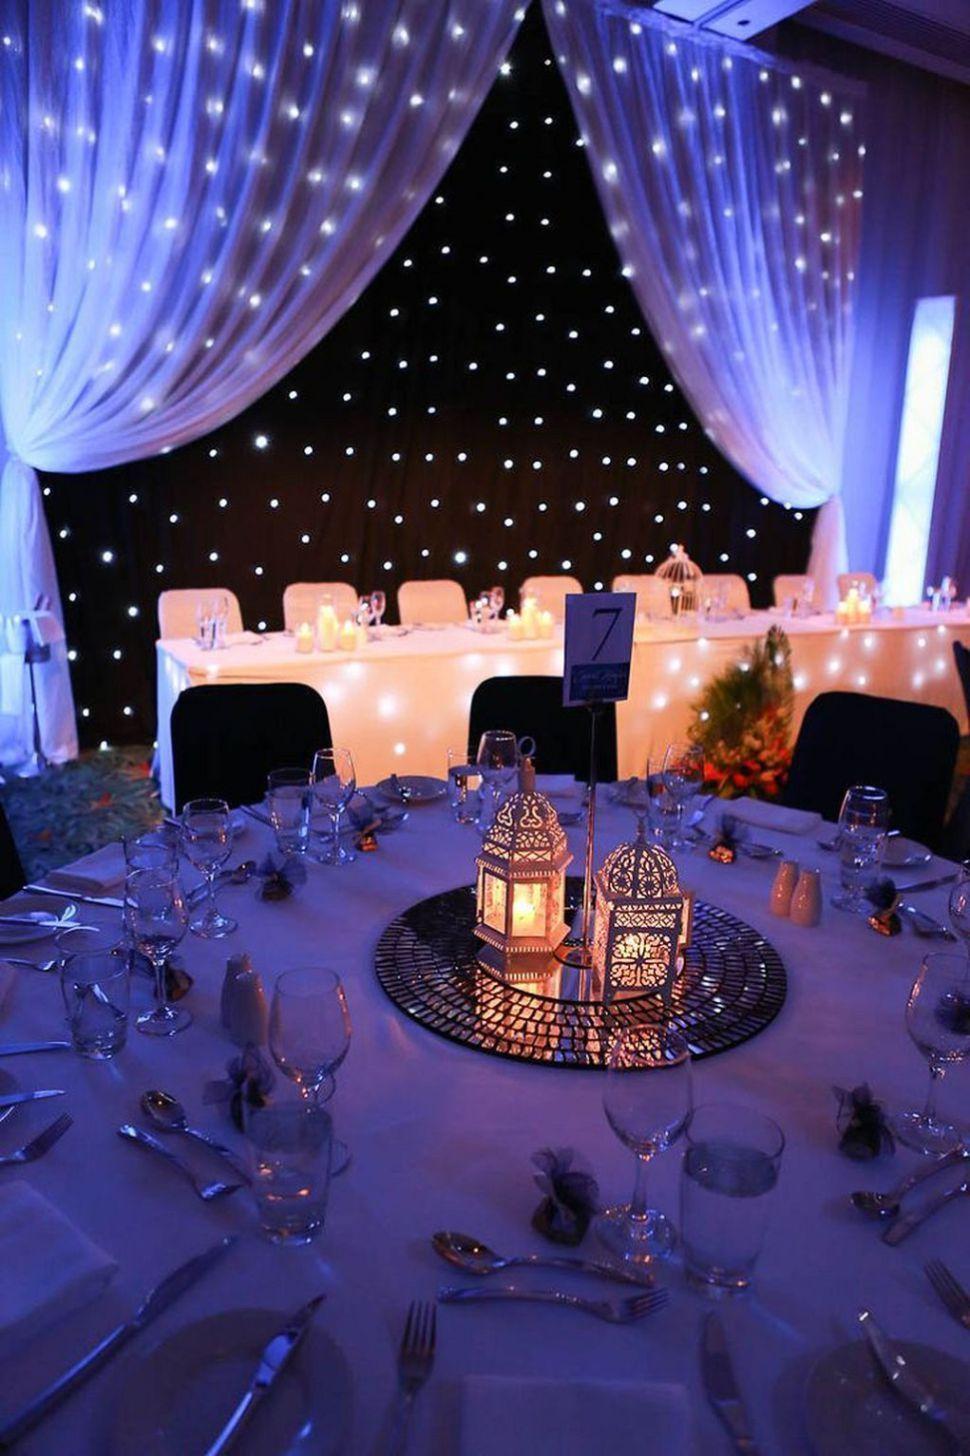 Wedding reception decoration ideas   Night Wedding Reception Decor Ideas  Reception Wedding